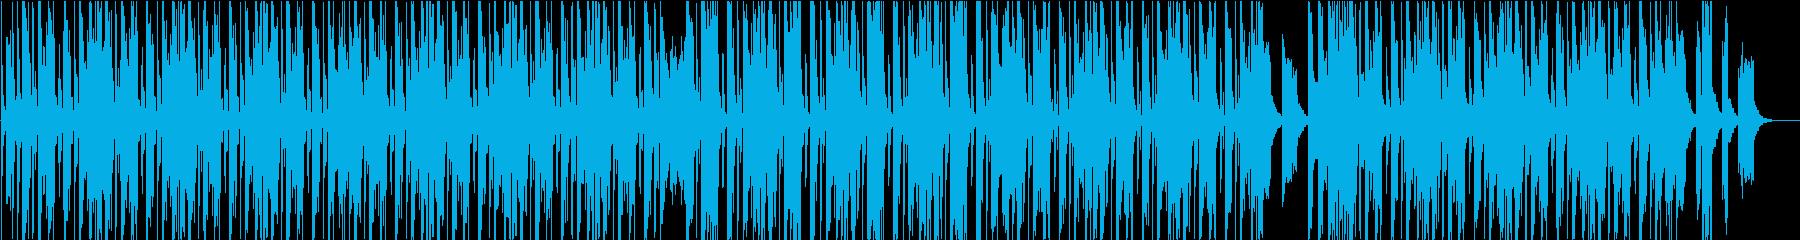 CM向けBoombapヒップホップの再生済みの波形